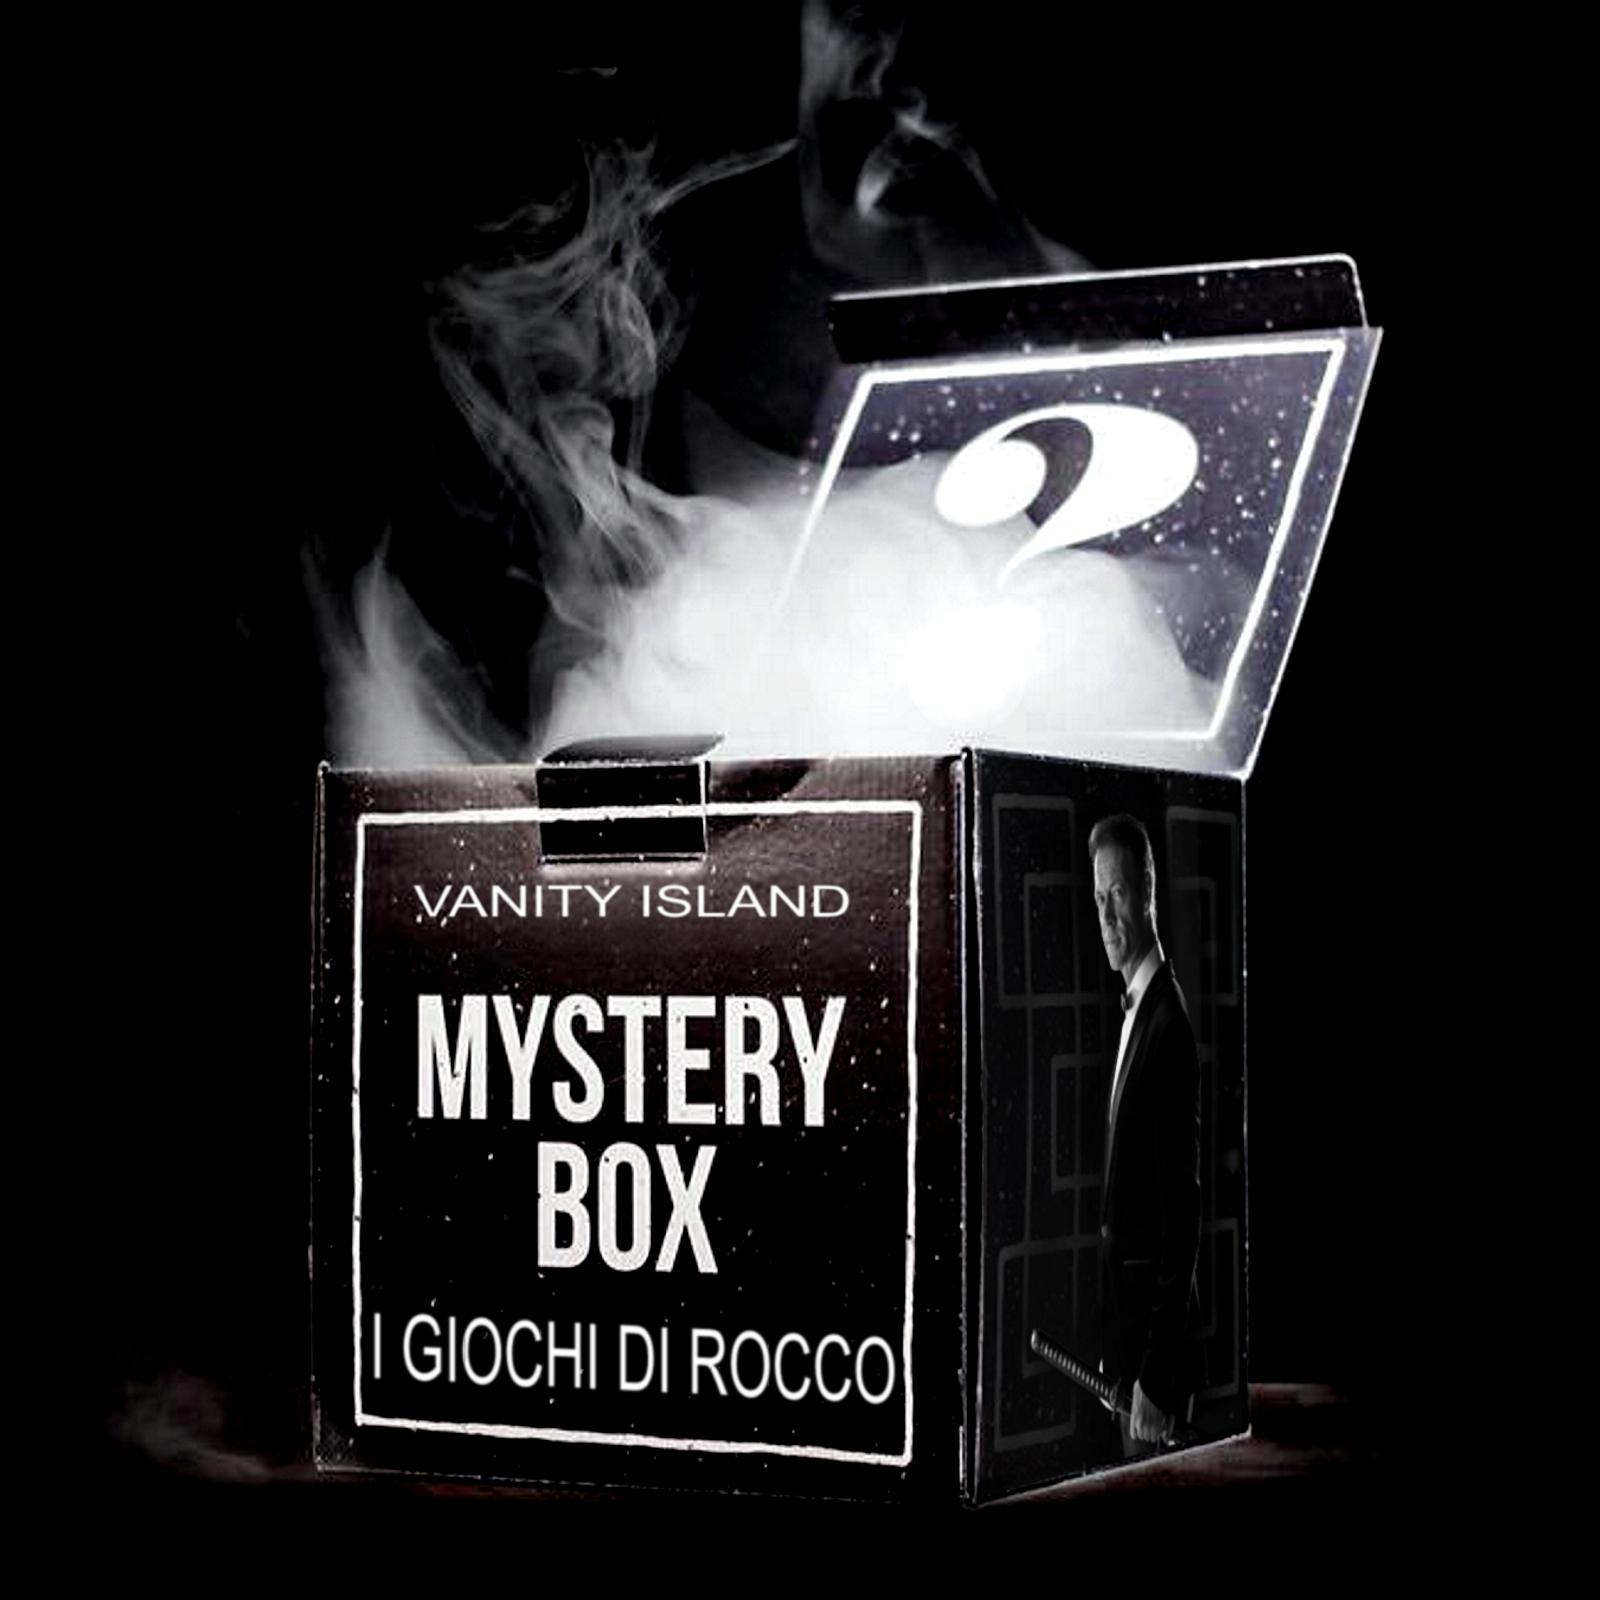 i giochi di rocco mystery box vanity island luxury